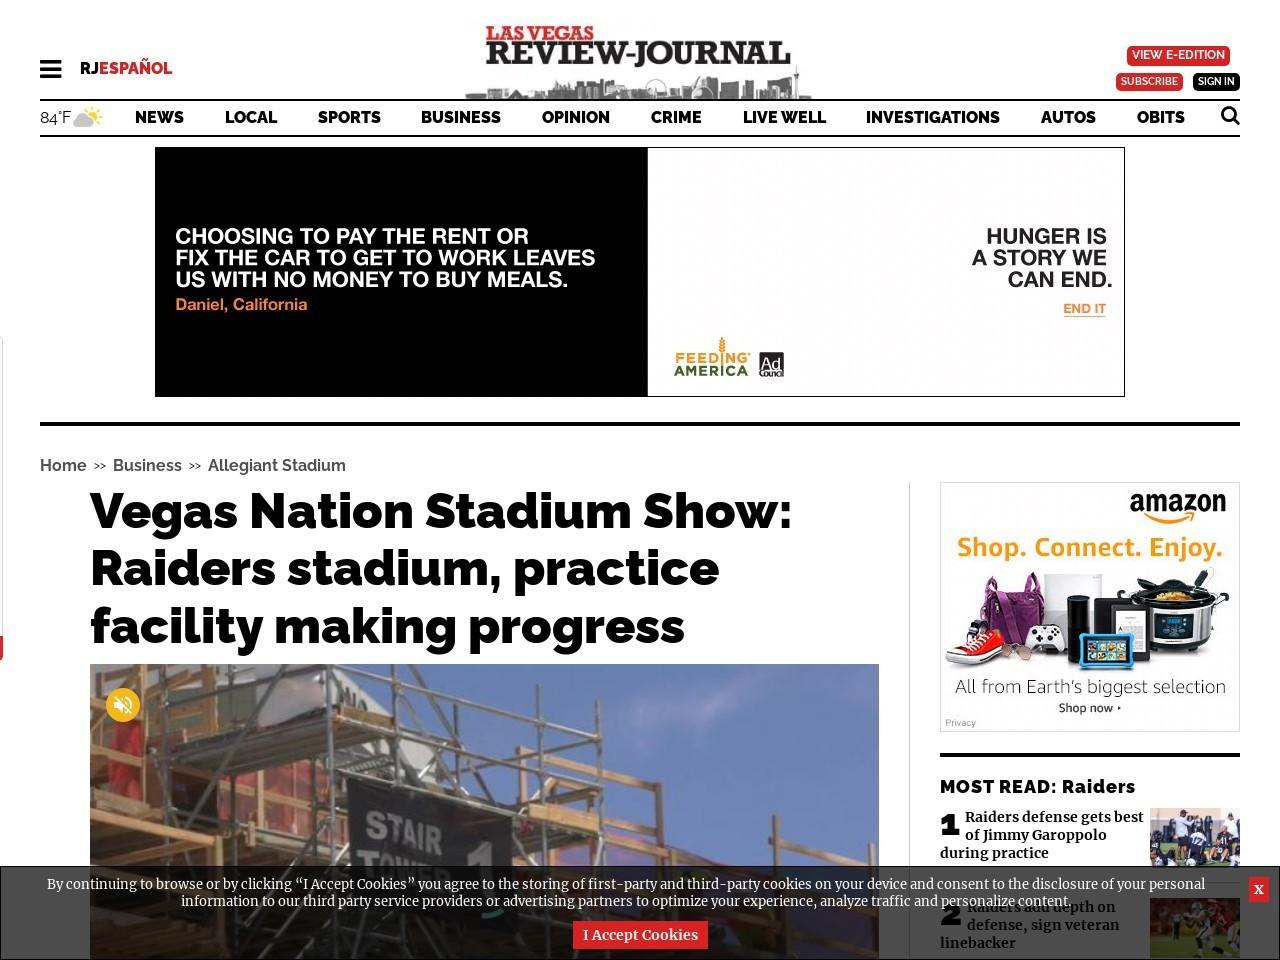 Vegas Nation Stadium Show: Raiders stadium, practice facility making progress